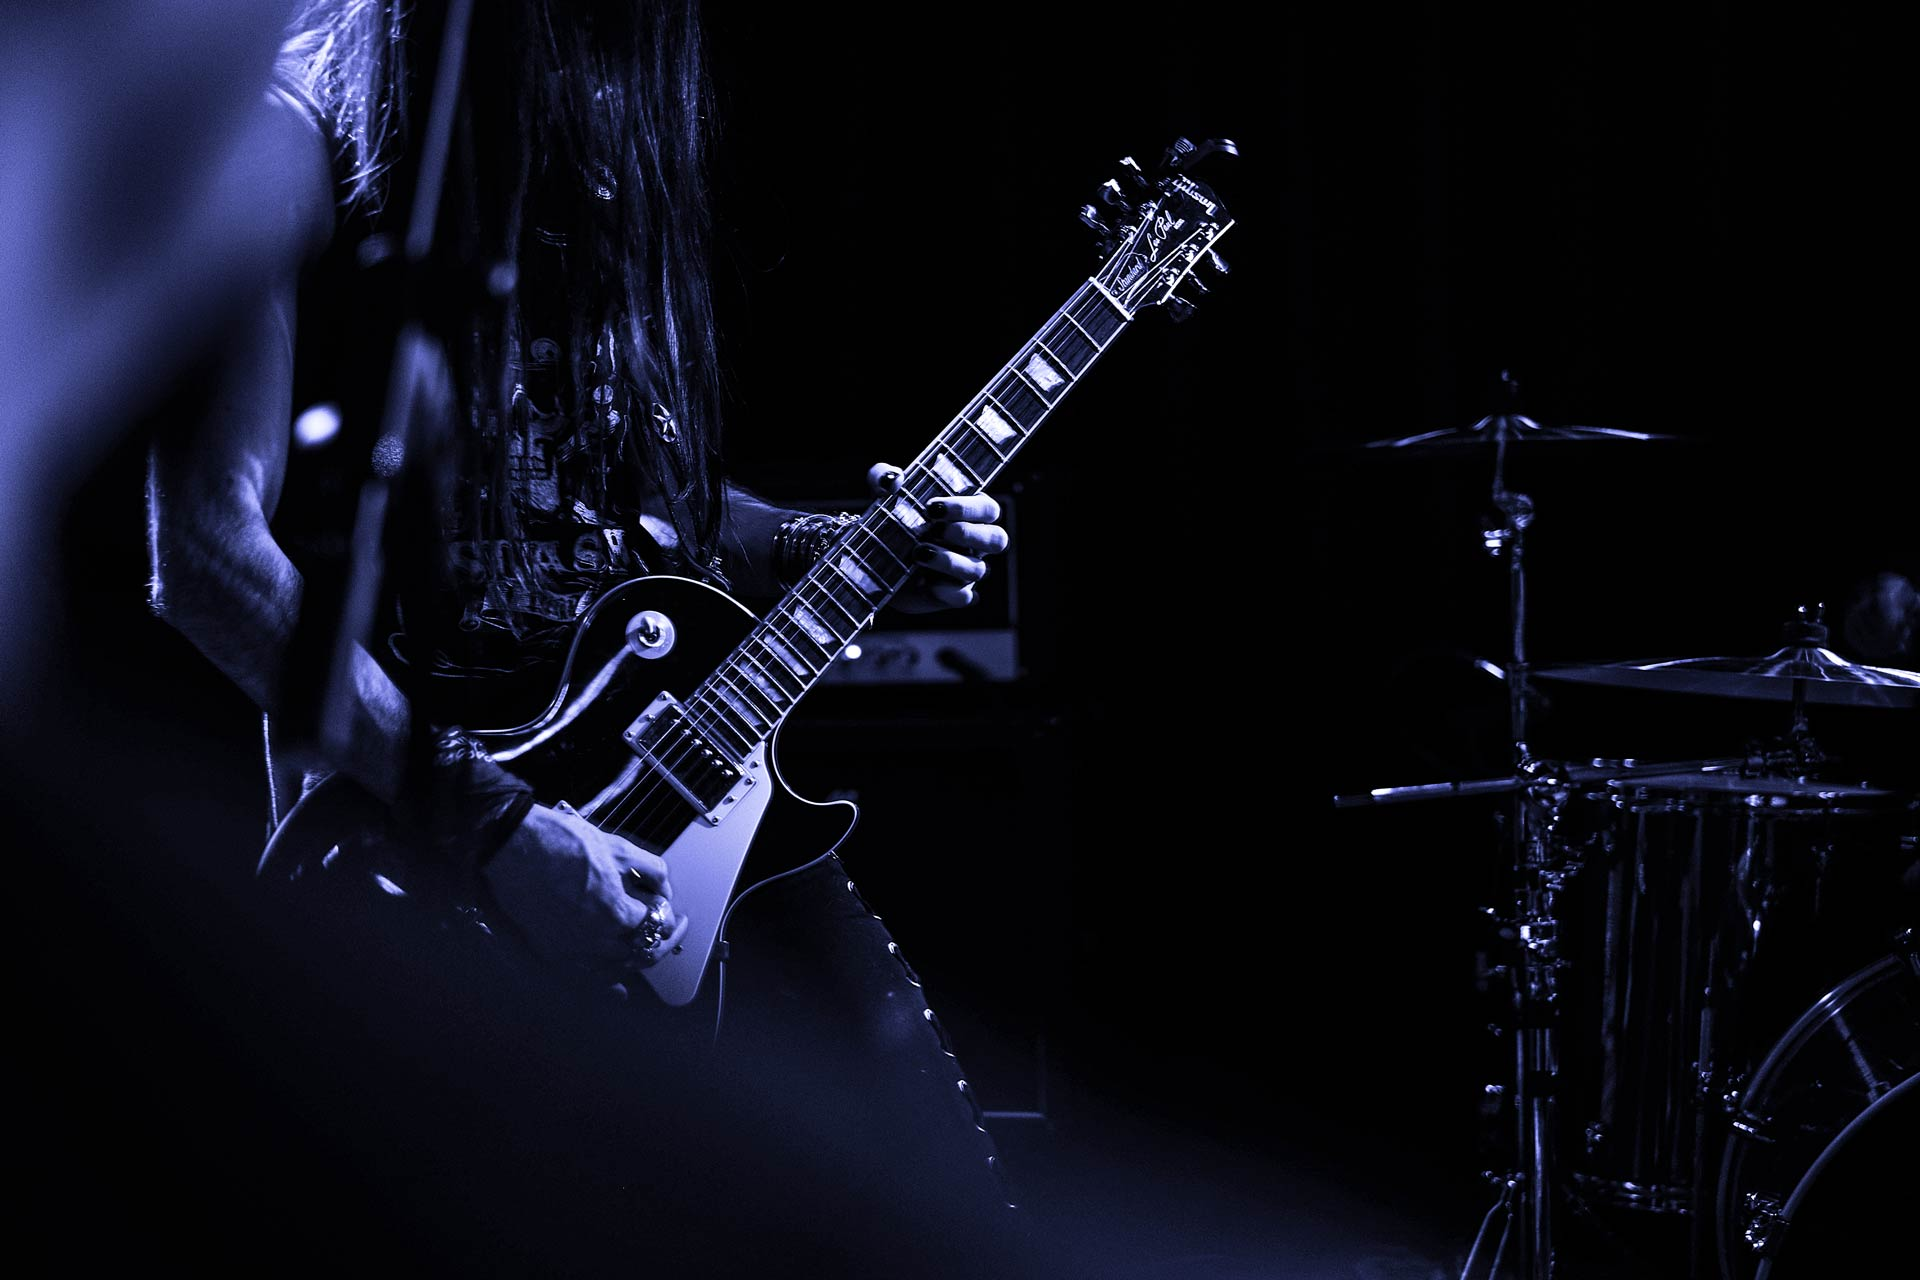 La Guitarra Creativa by Javier Aviles ABOUT